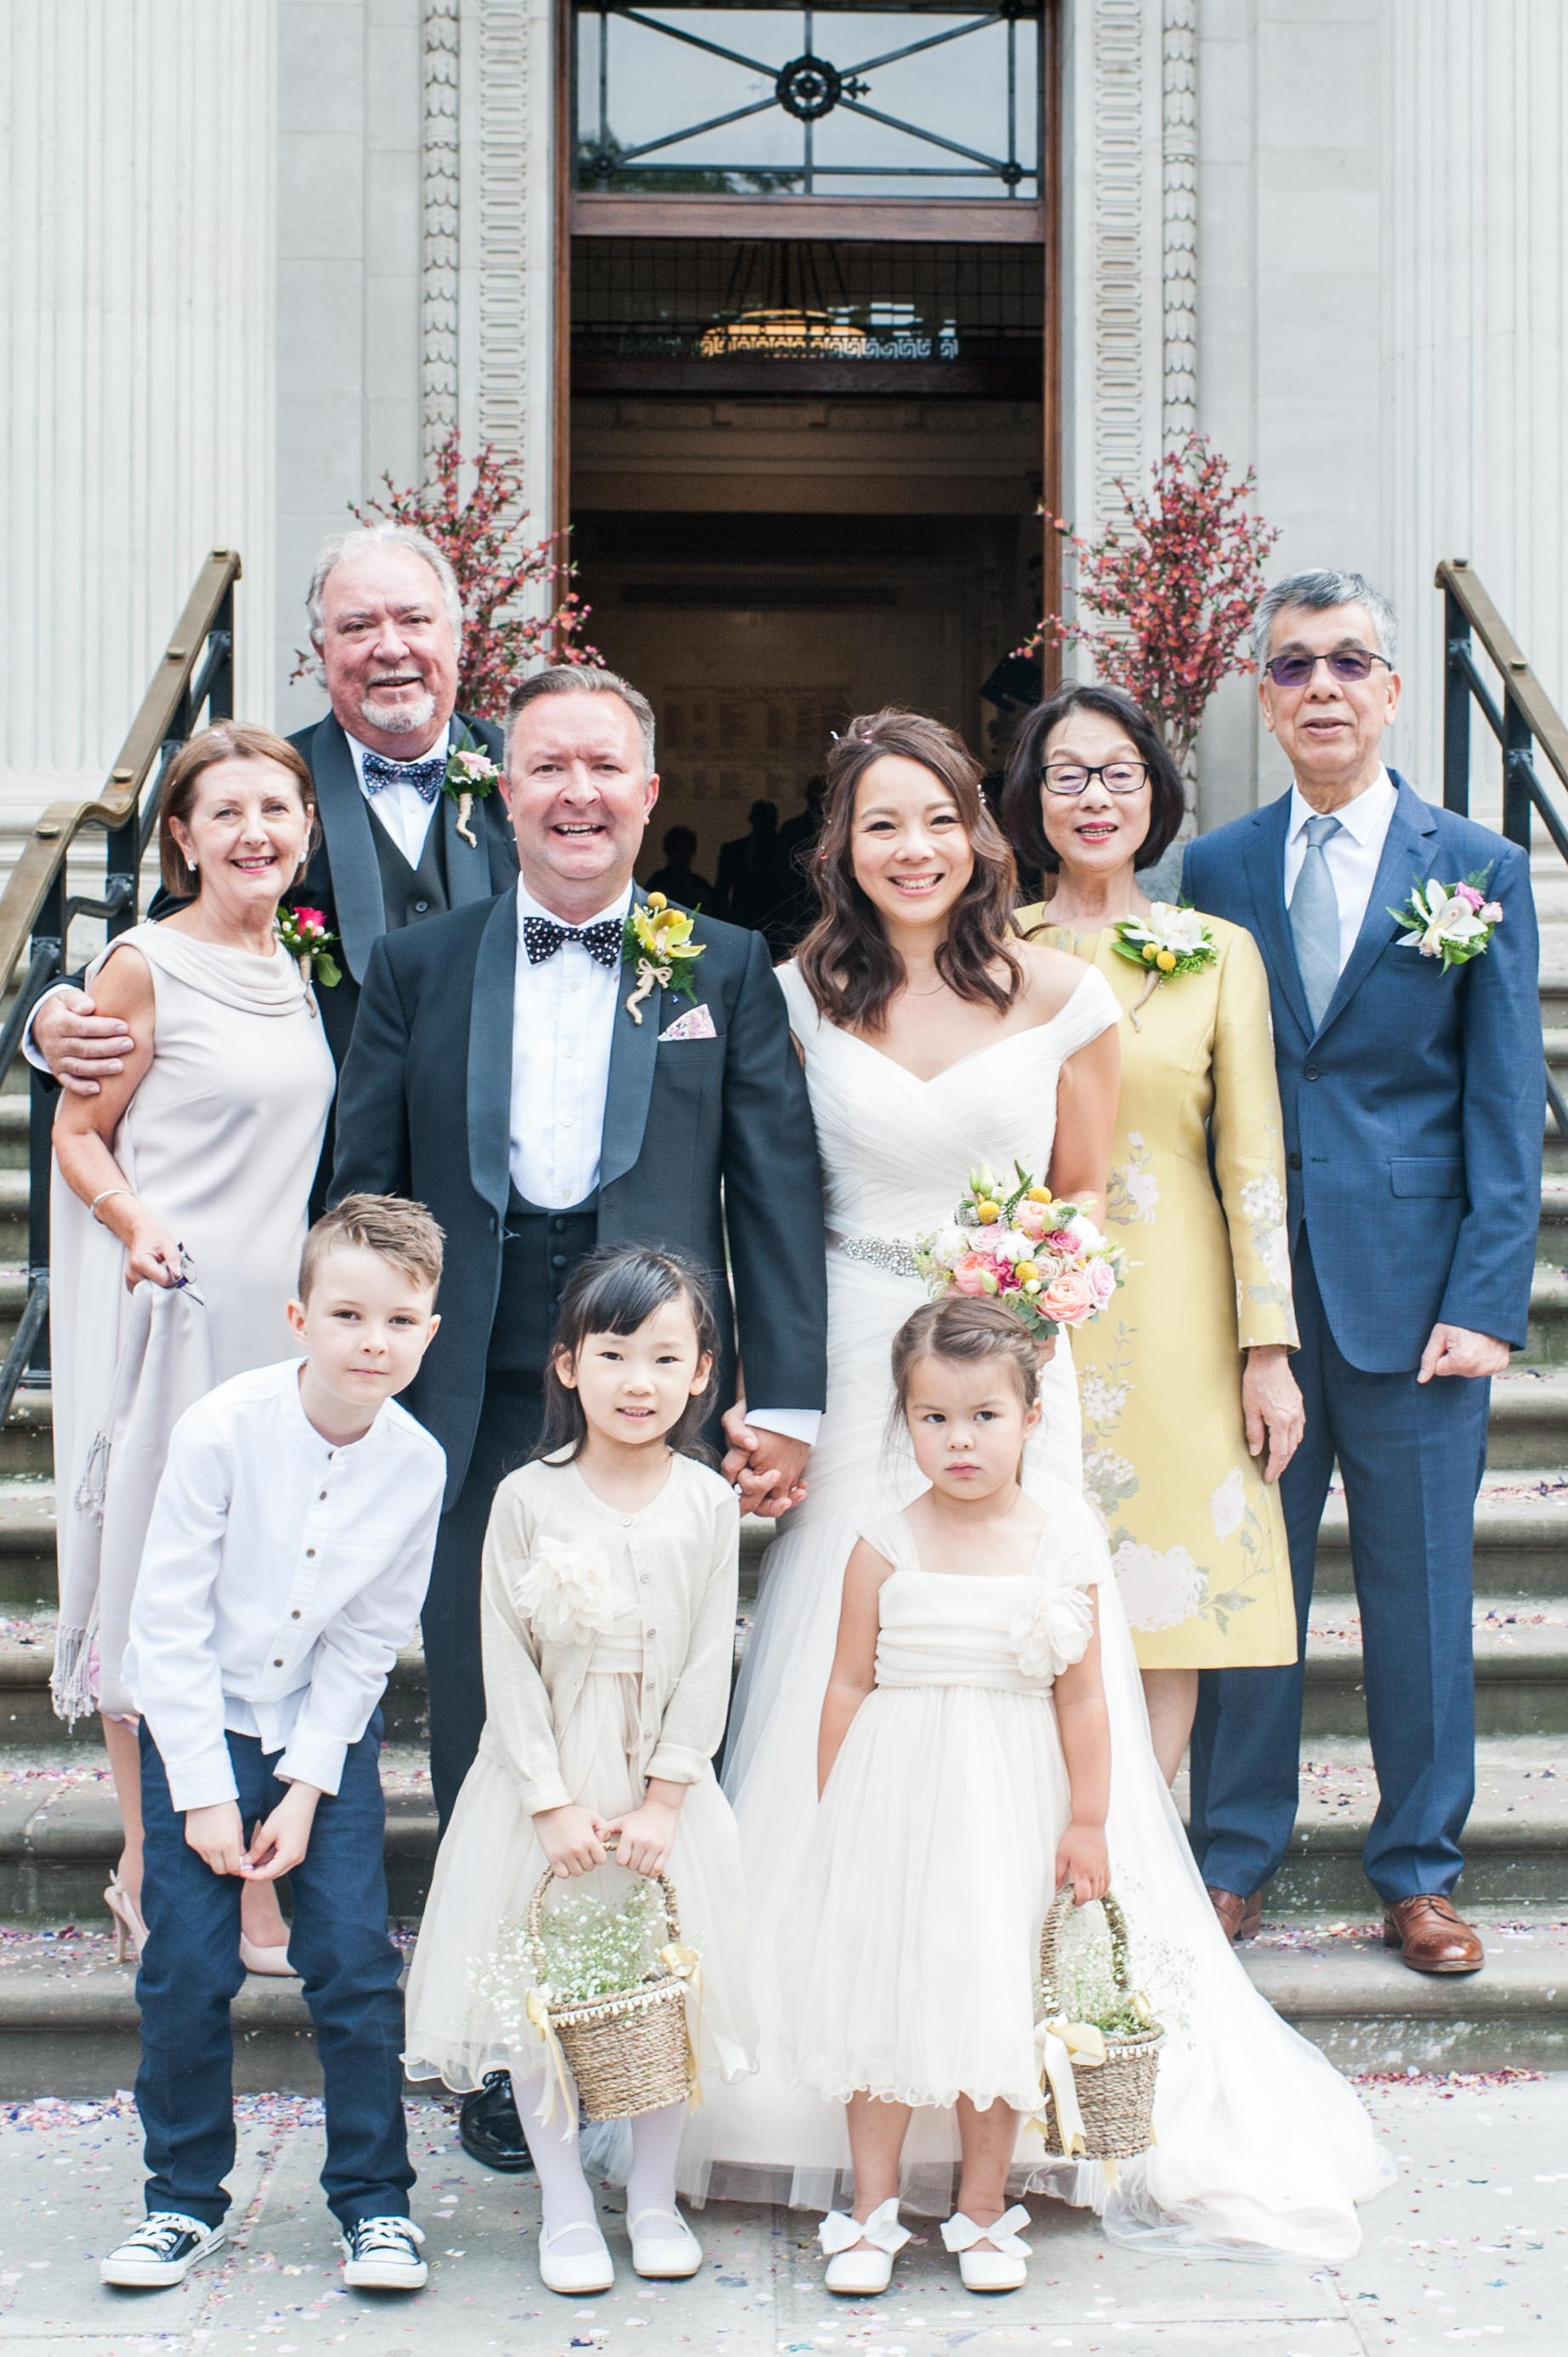 D&M_Marylebone Town Hall Wedding (132 of 239).jpg